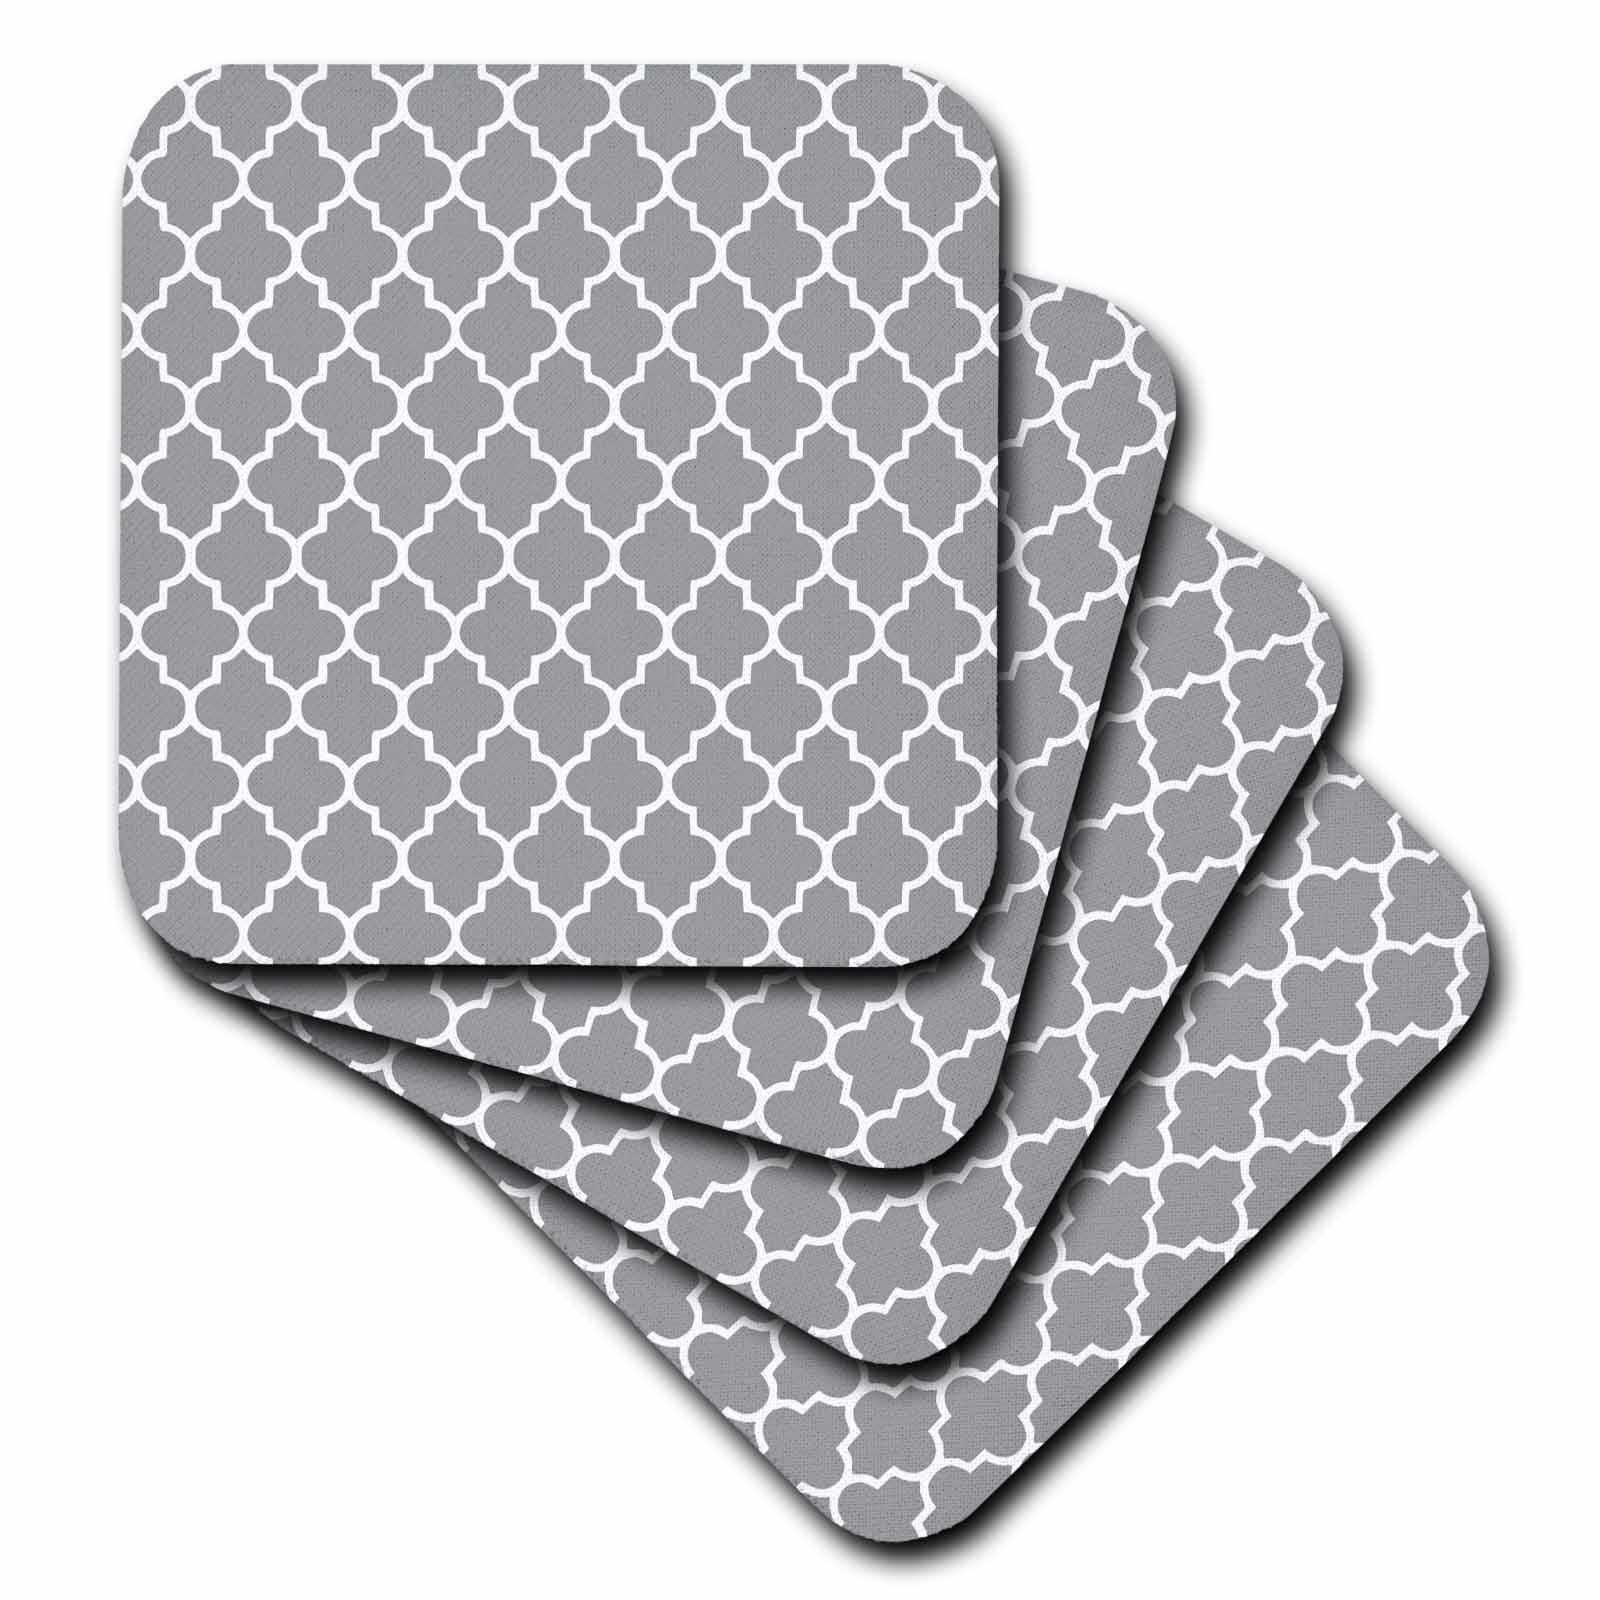 3dRose Dark gray quatrefoil pattern - grey Moroccan tiles - modern stylish geometric clover lattice, Soft Coasters, set of 8